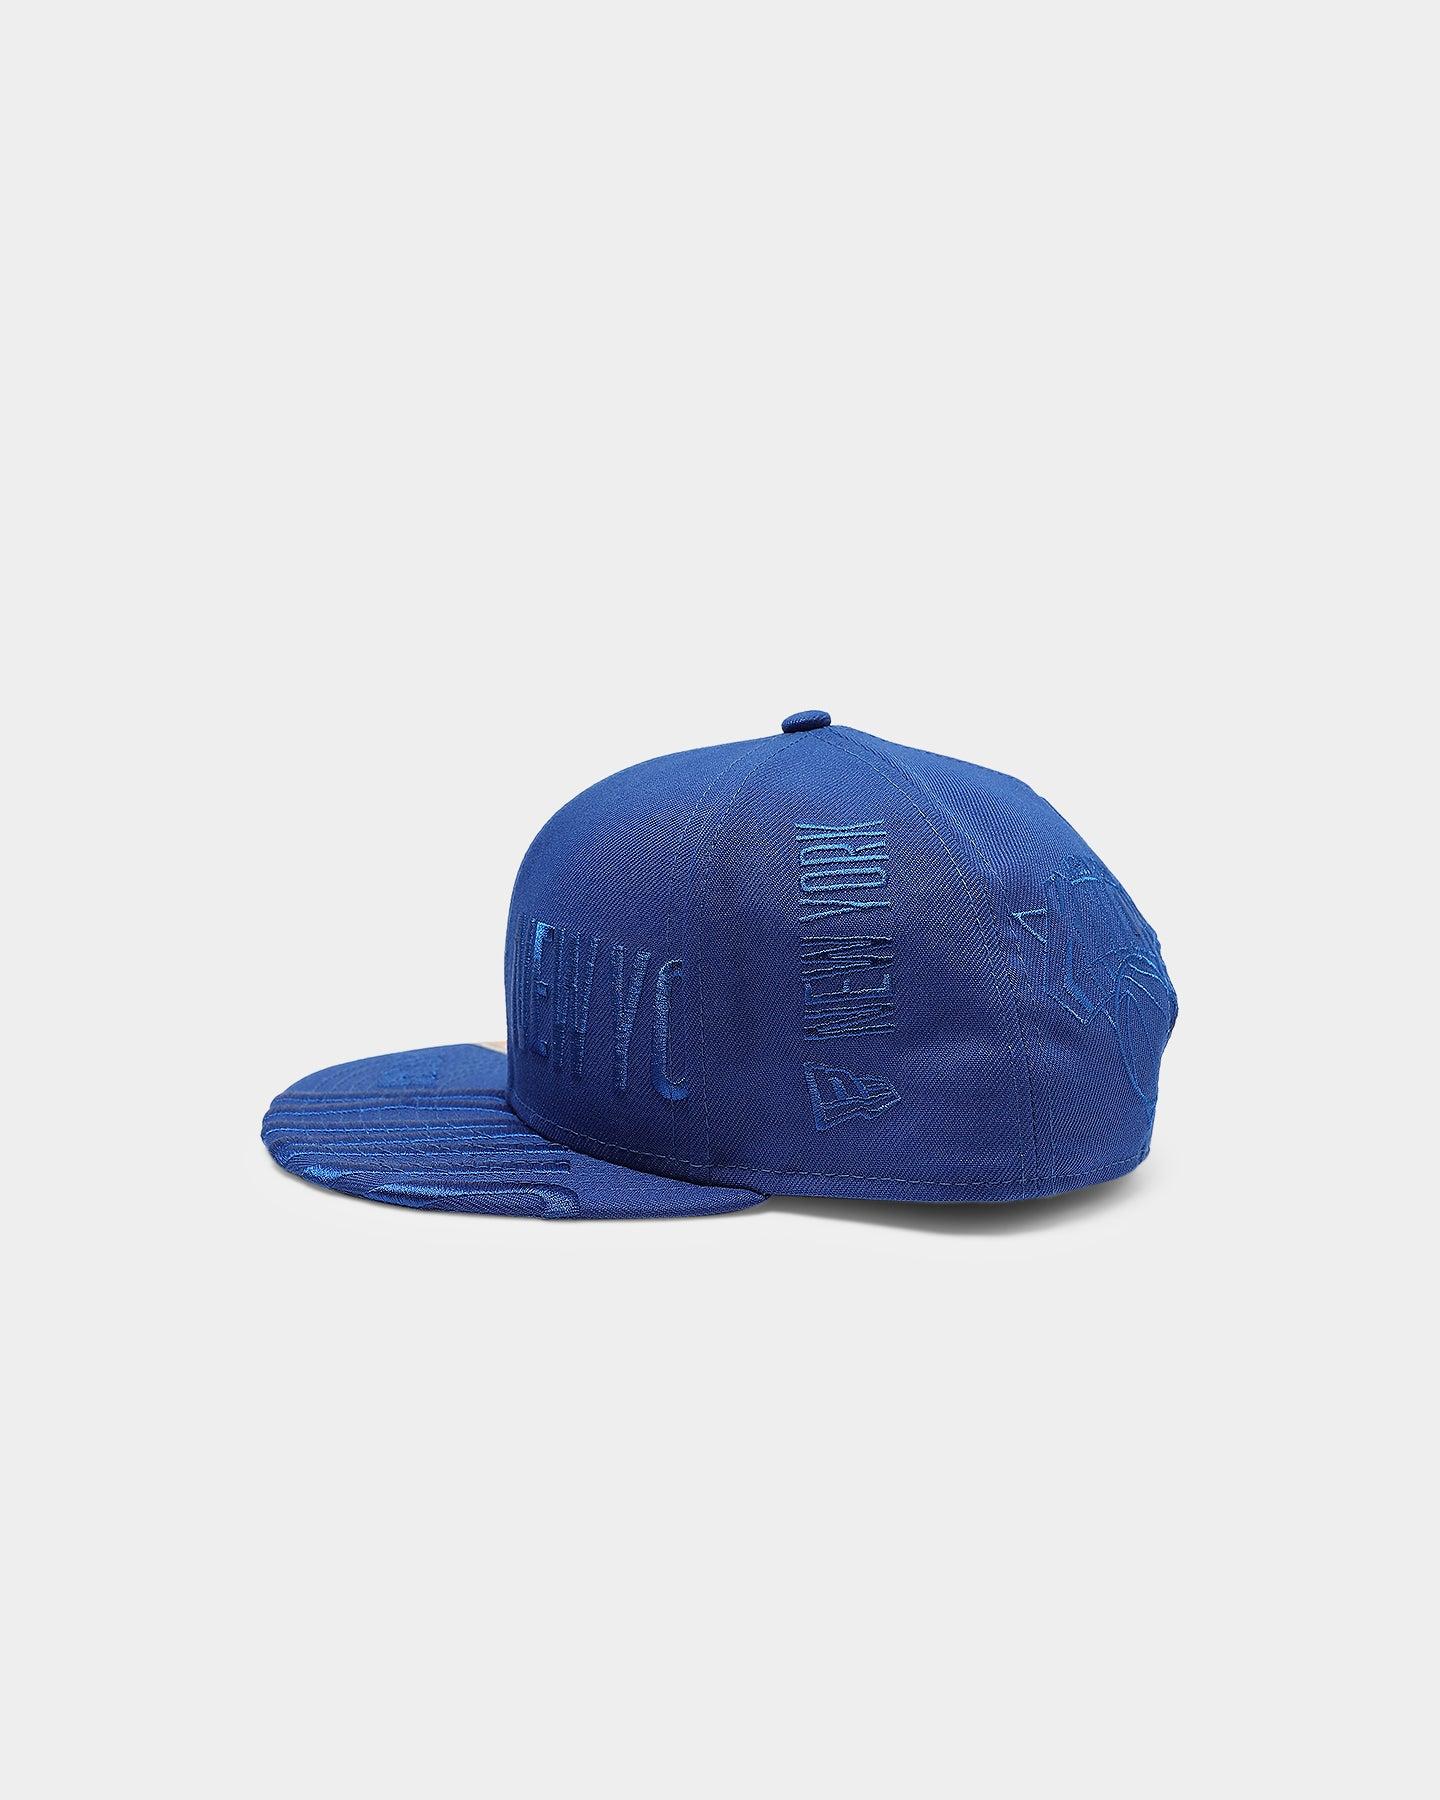 NBA New York Knicks Era 9FIFTY Snapback Cap Hat Headwear Mens